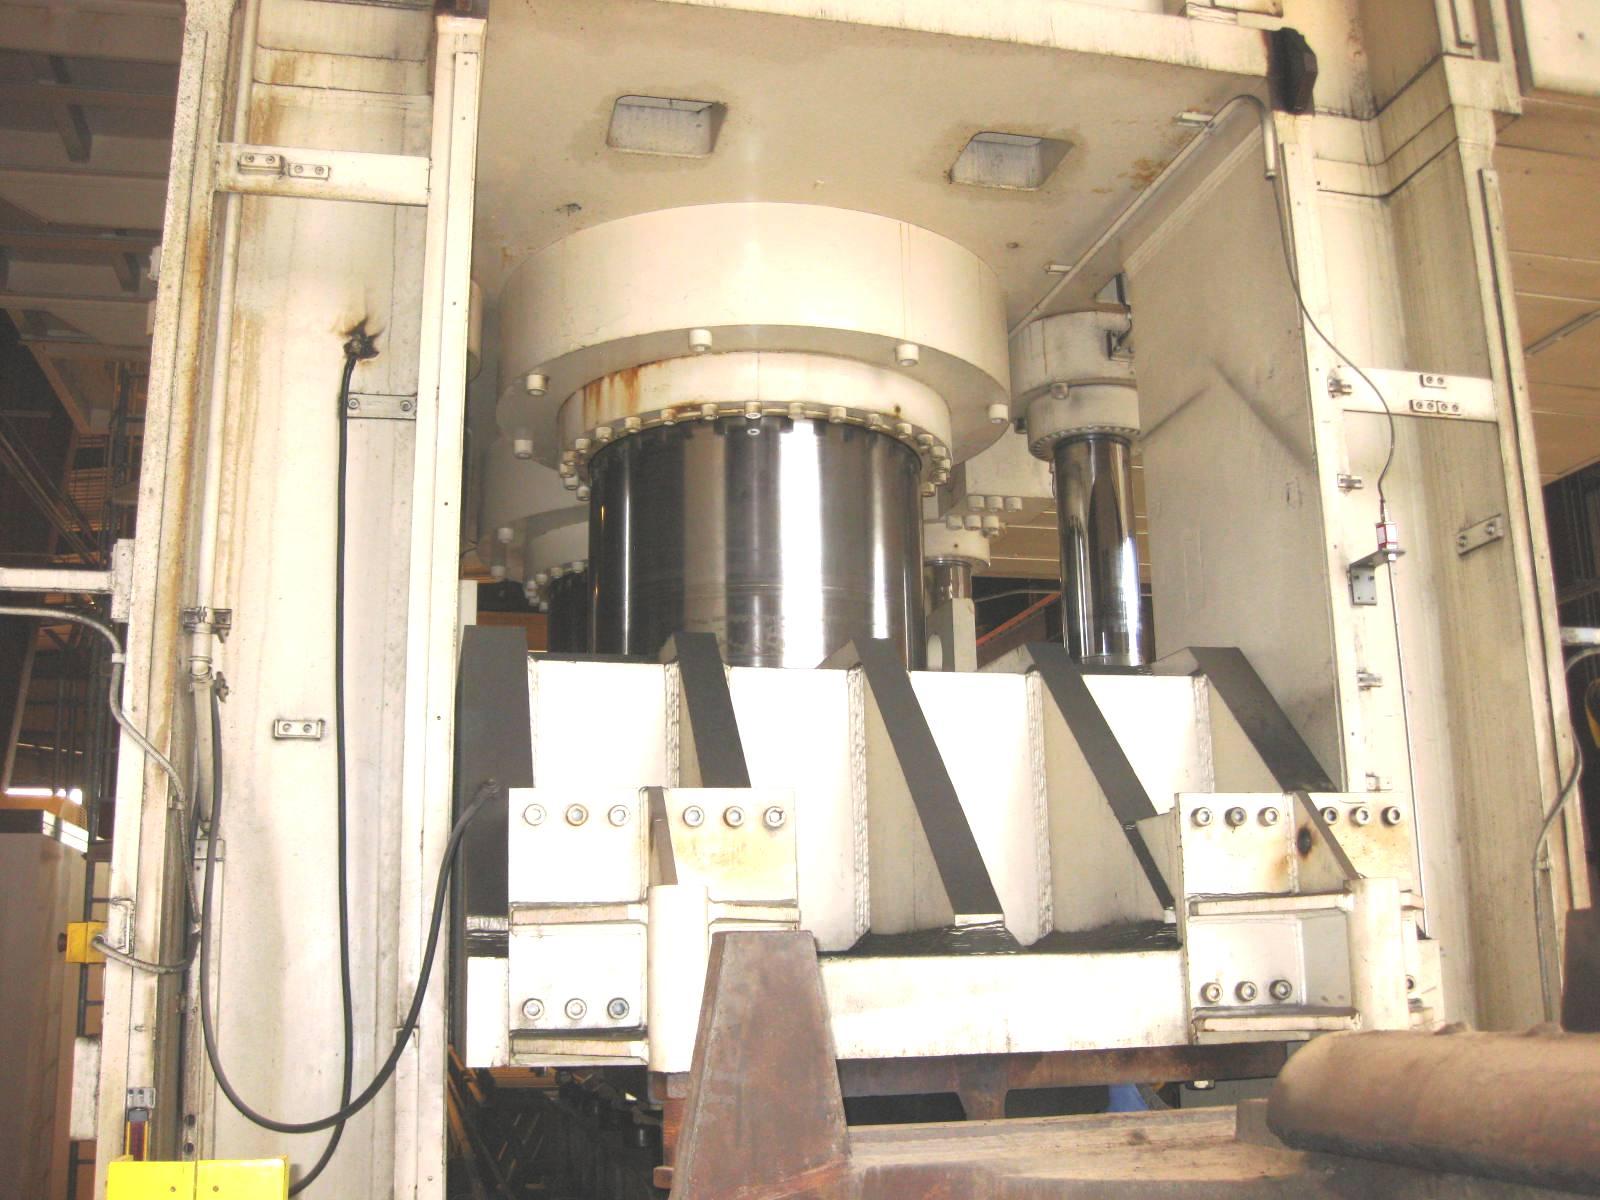 7860 Ton Siempelkamp Downacting Hydraulic Press, model